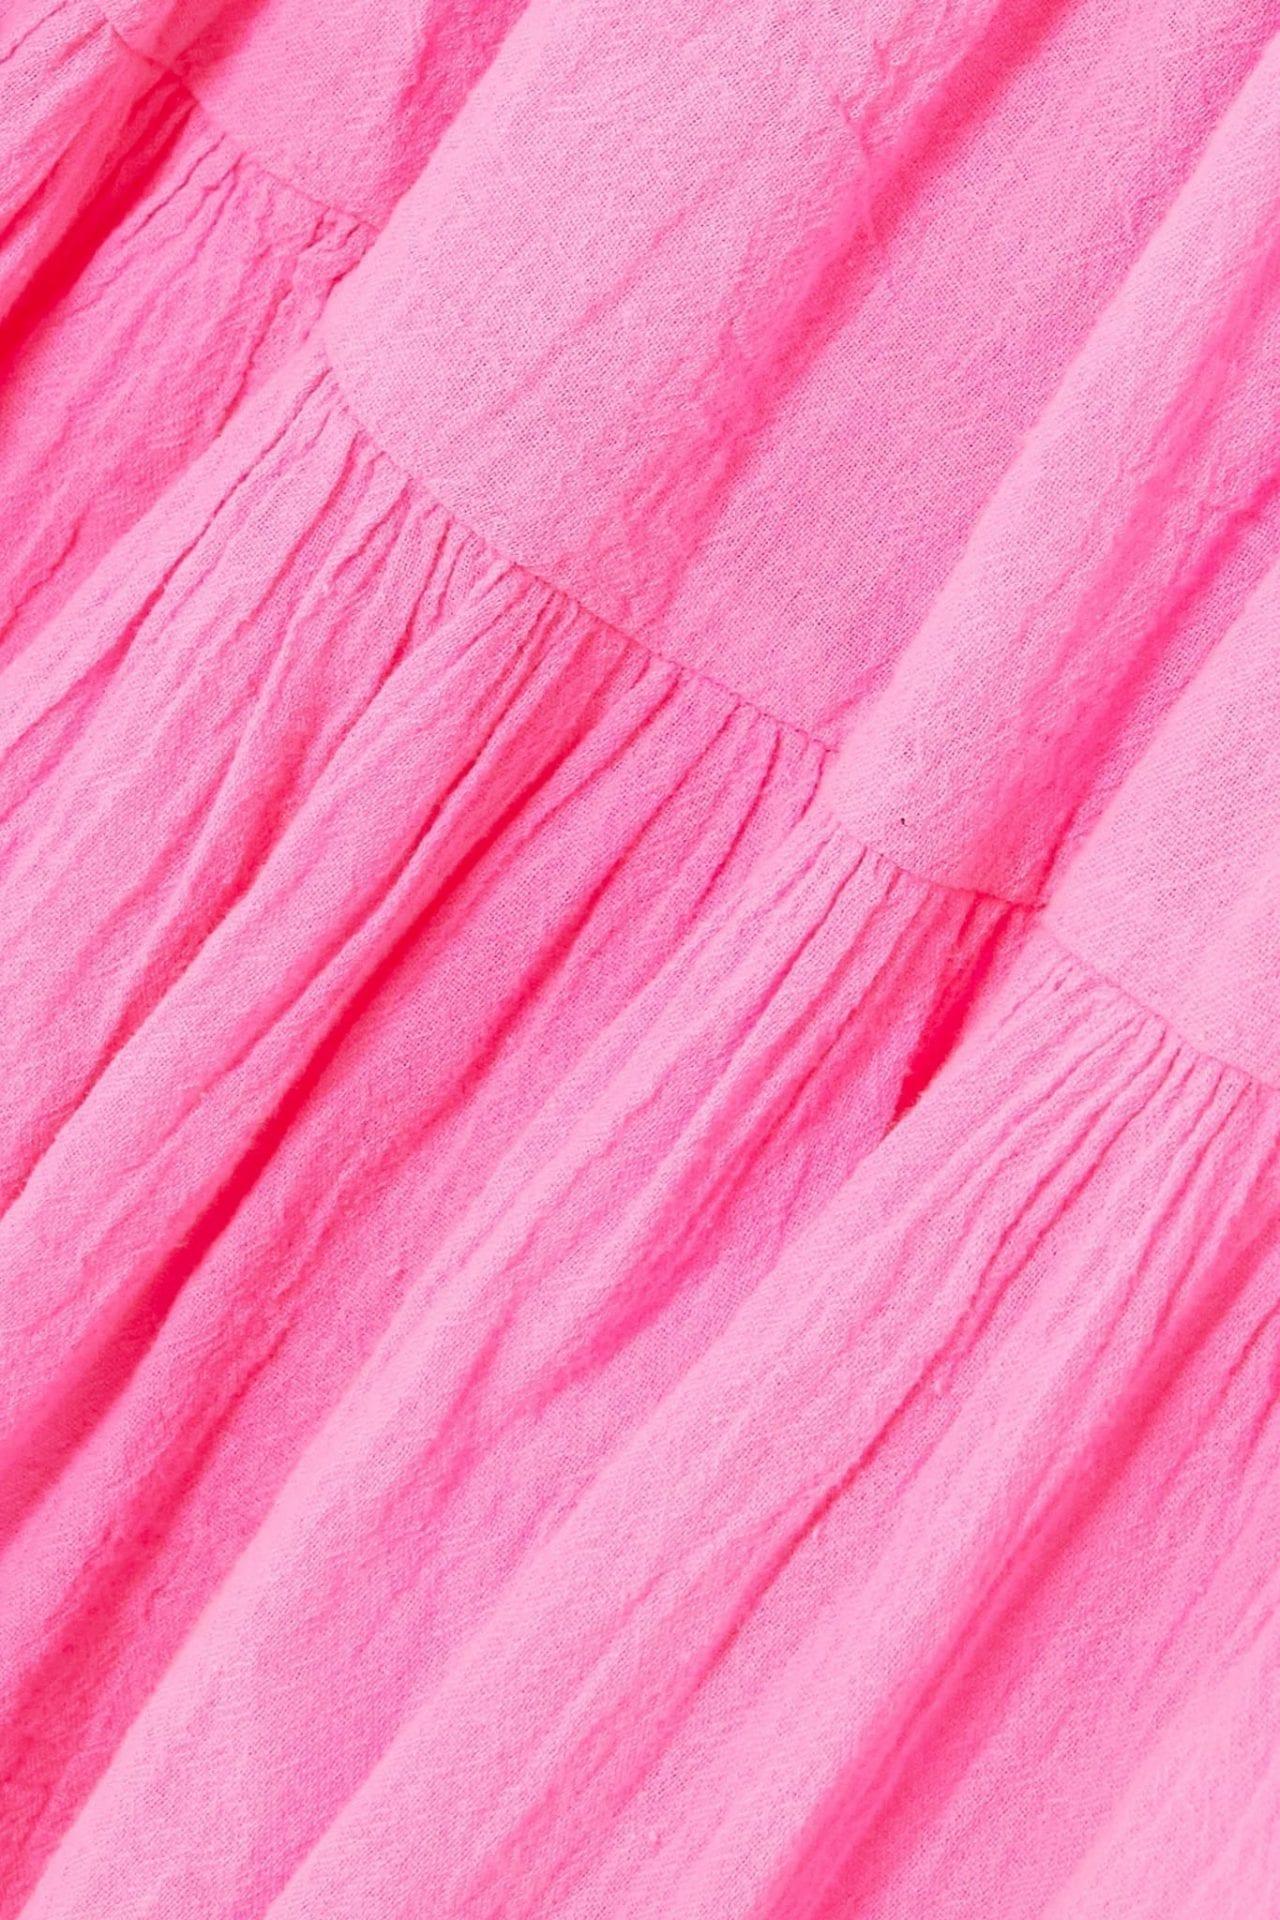 HONORINE Peri Tiered Neon Crinkled Cotton-gauze Mini Dress